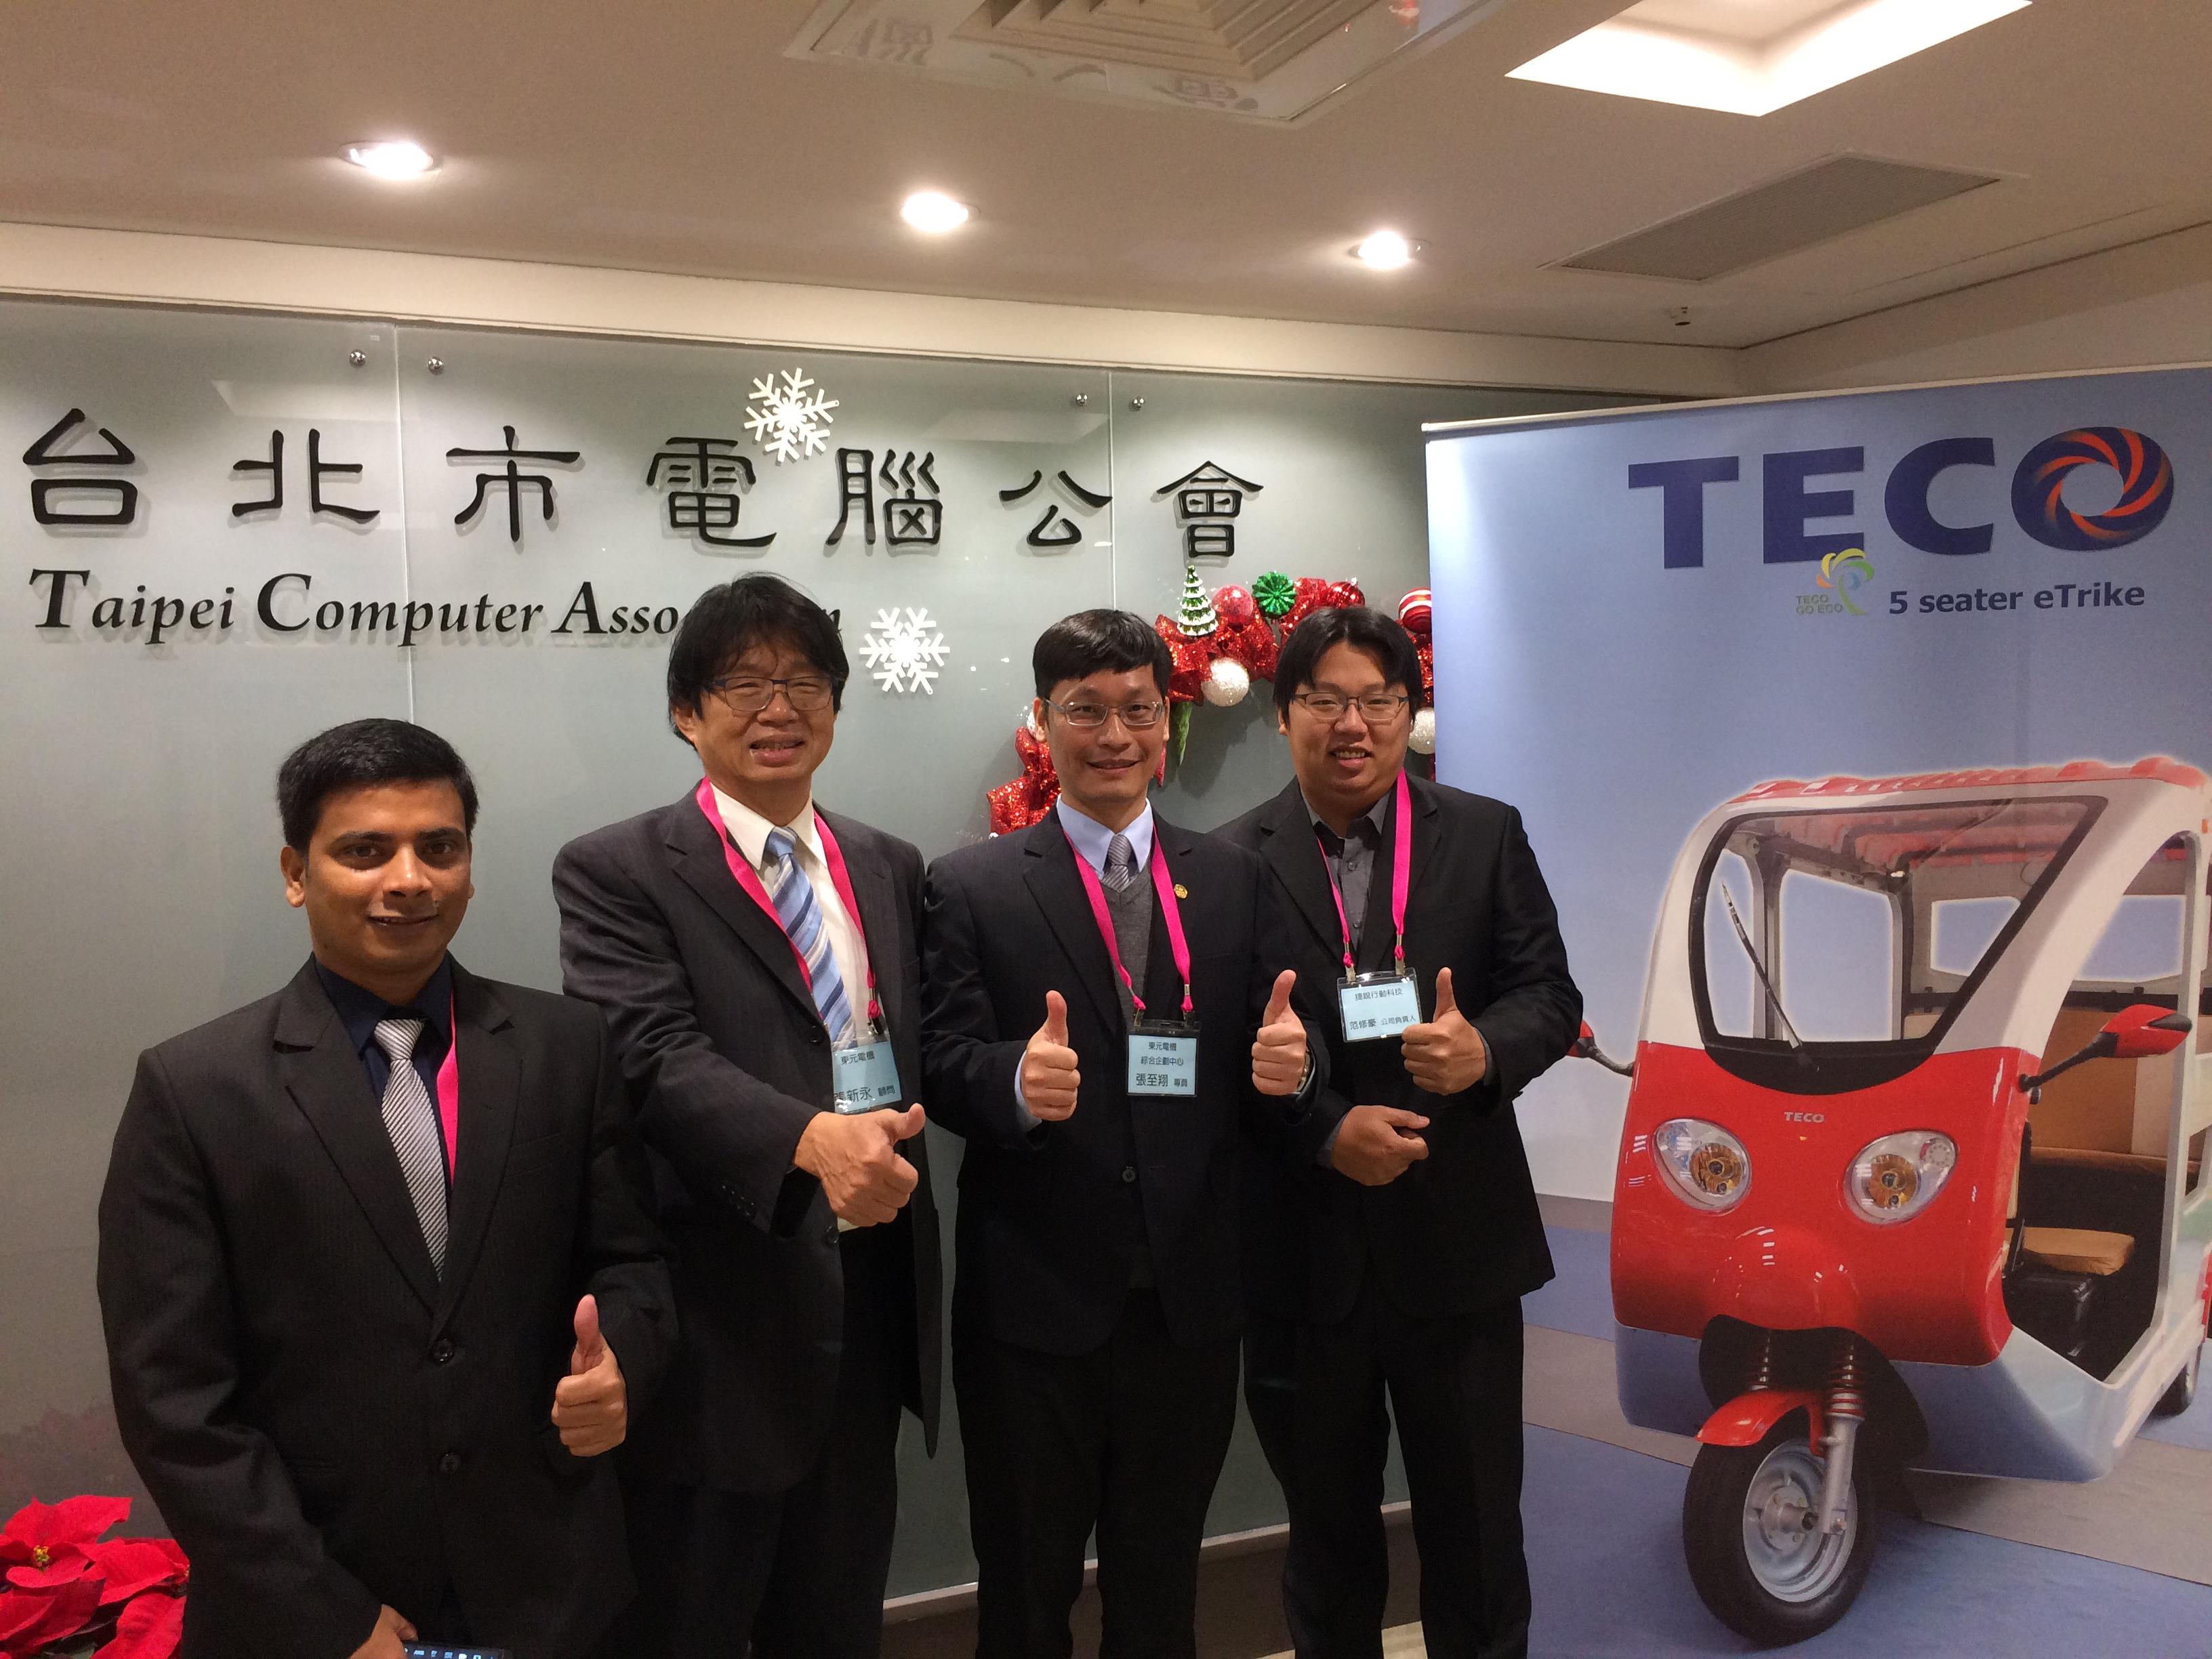 TECO Granted System Integration Export Award for Smart E-Rickshaw